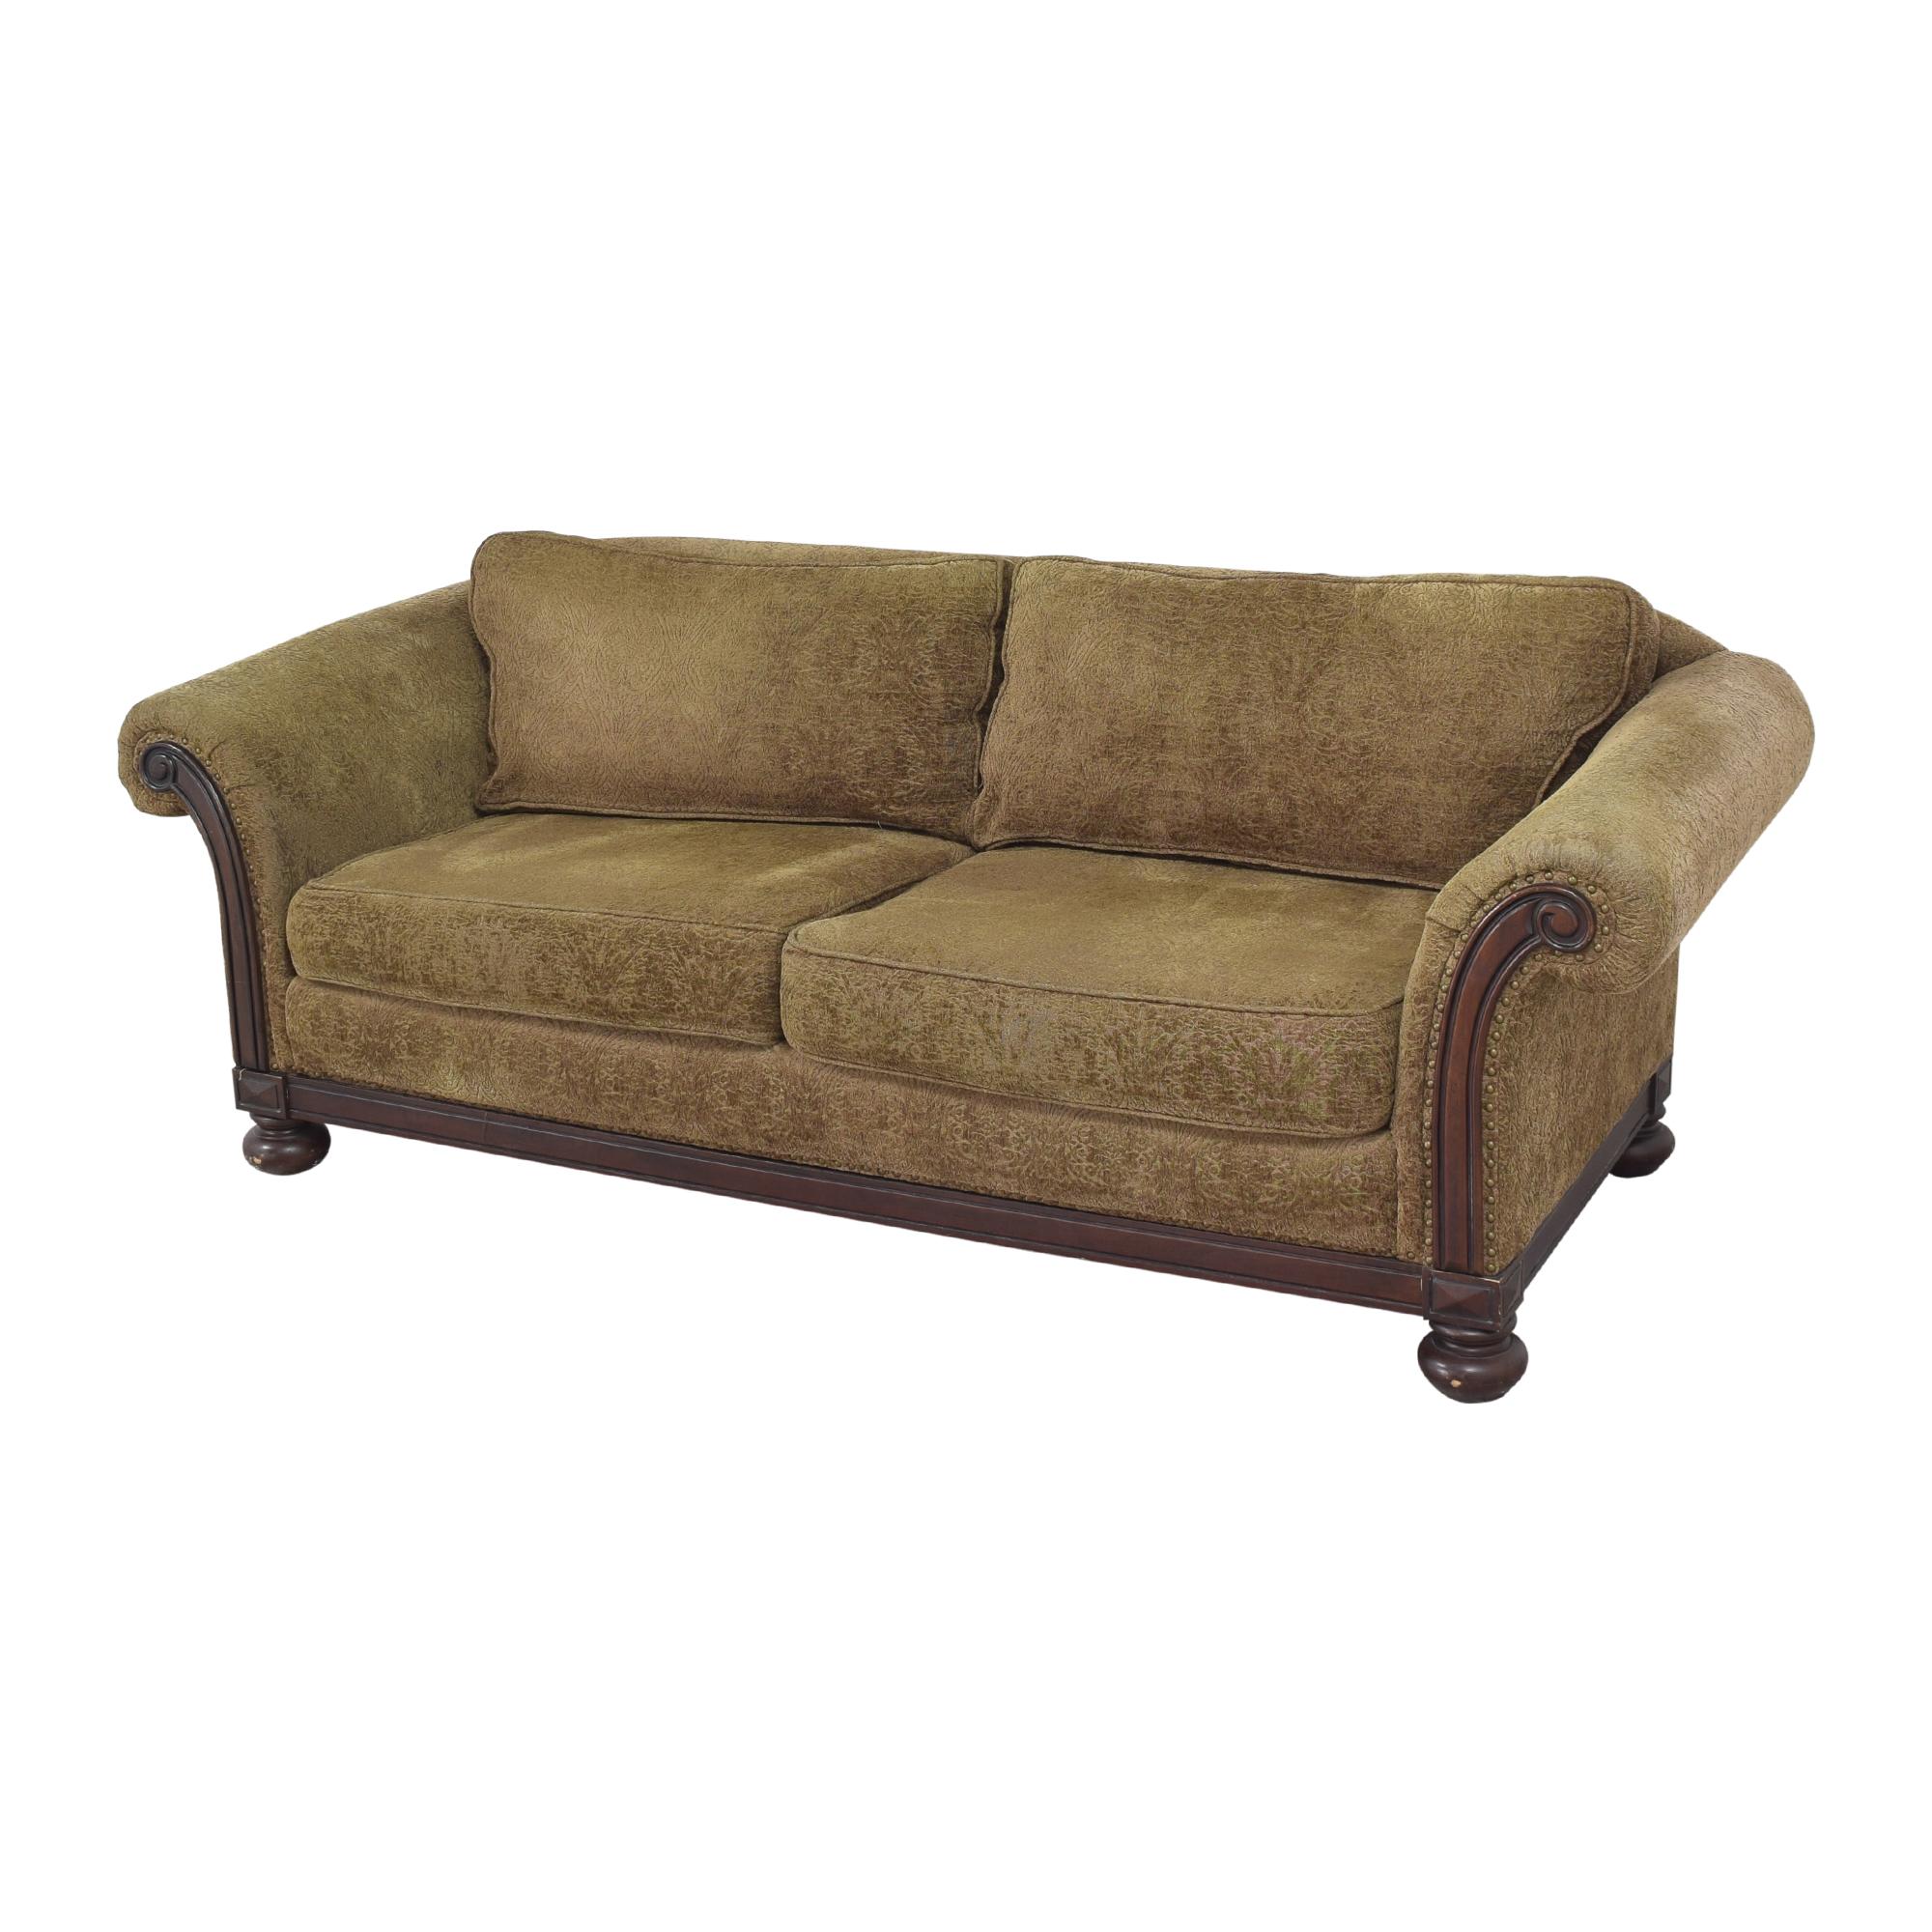 Bernhardt Bernhardt Two Cushion Roll Arm Sofa brown